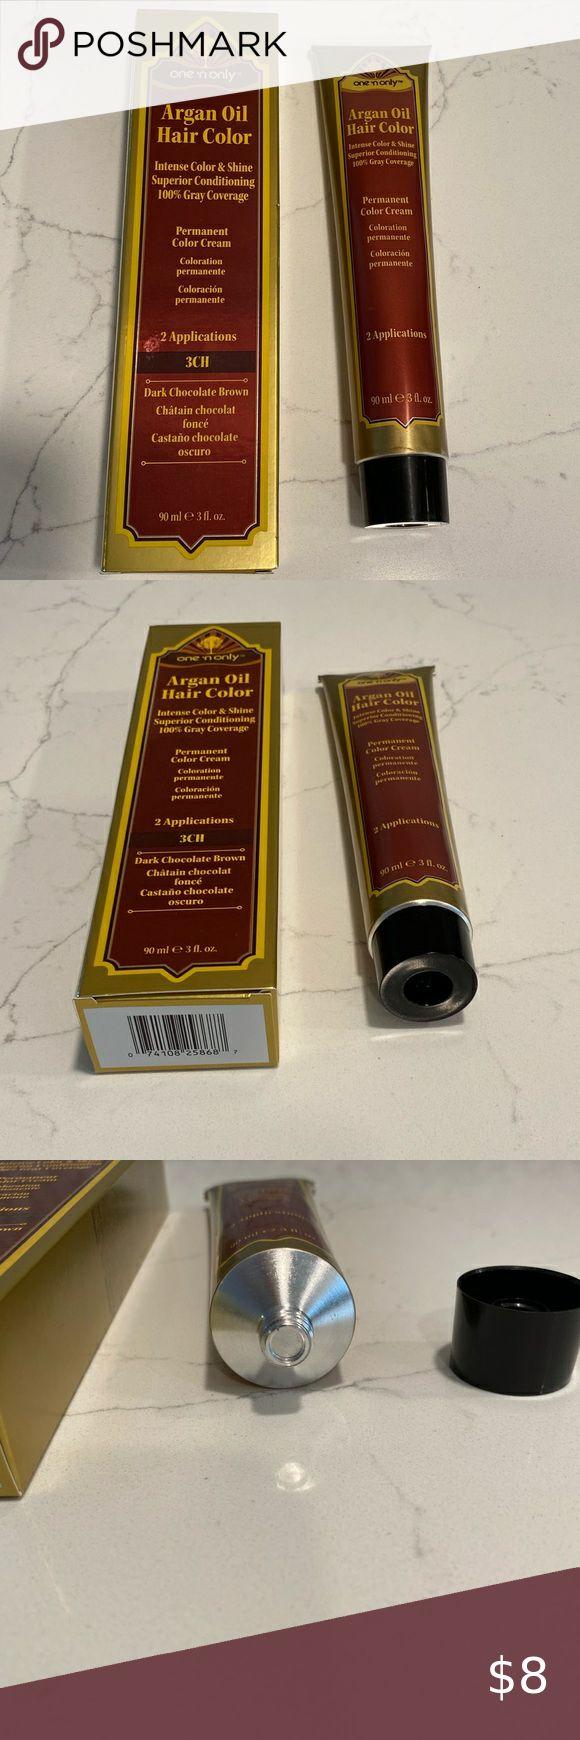 One N Only Argan Oil Hair Color 3ch Argan Oil Hair Color Argan Oil Hair Hair Color